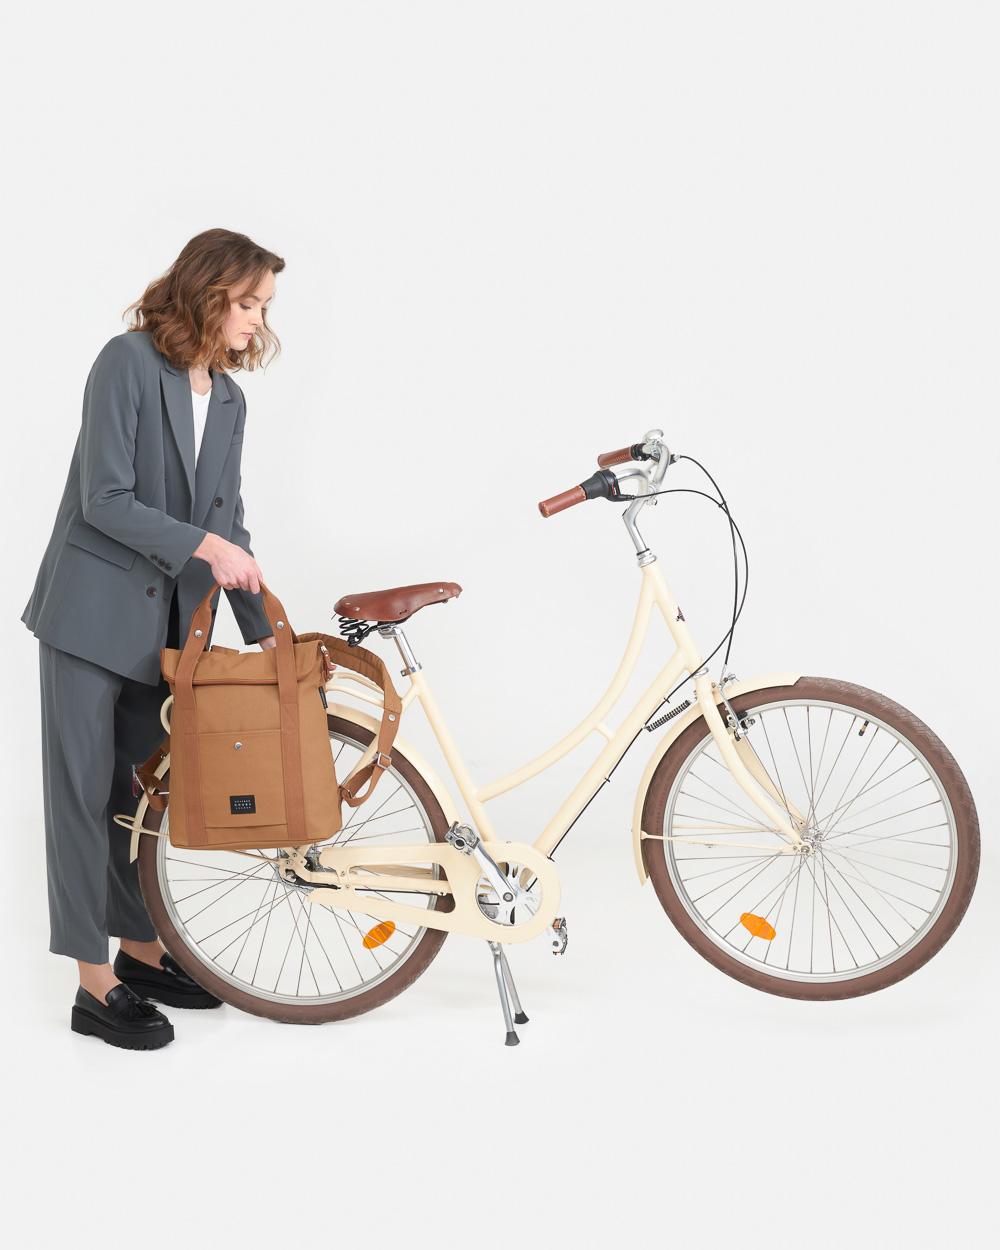 weathergoods-city-bikepack-xl-cognac-home-06-mobile-13